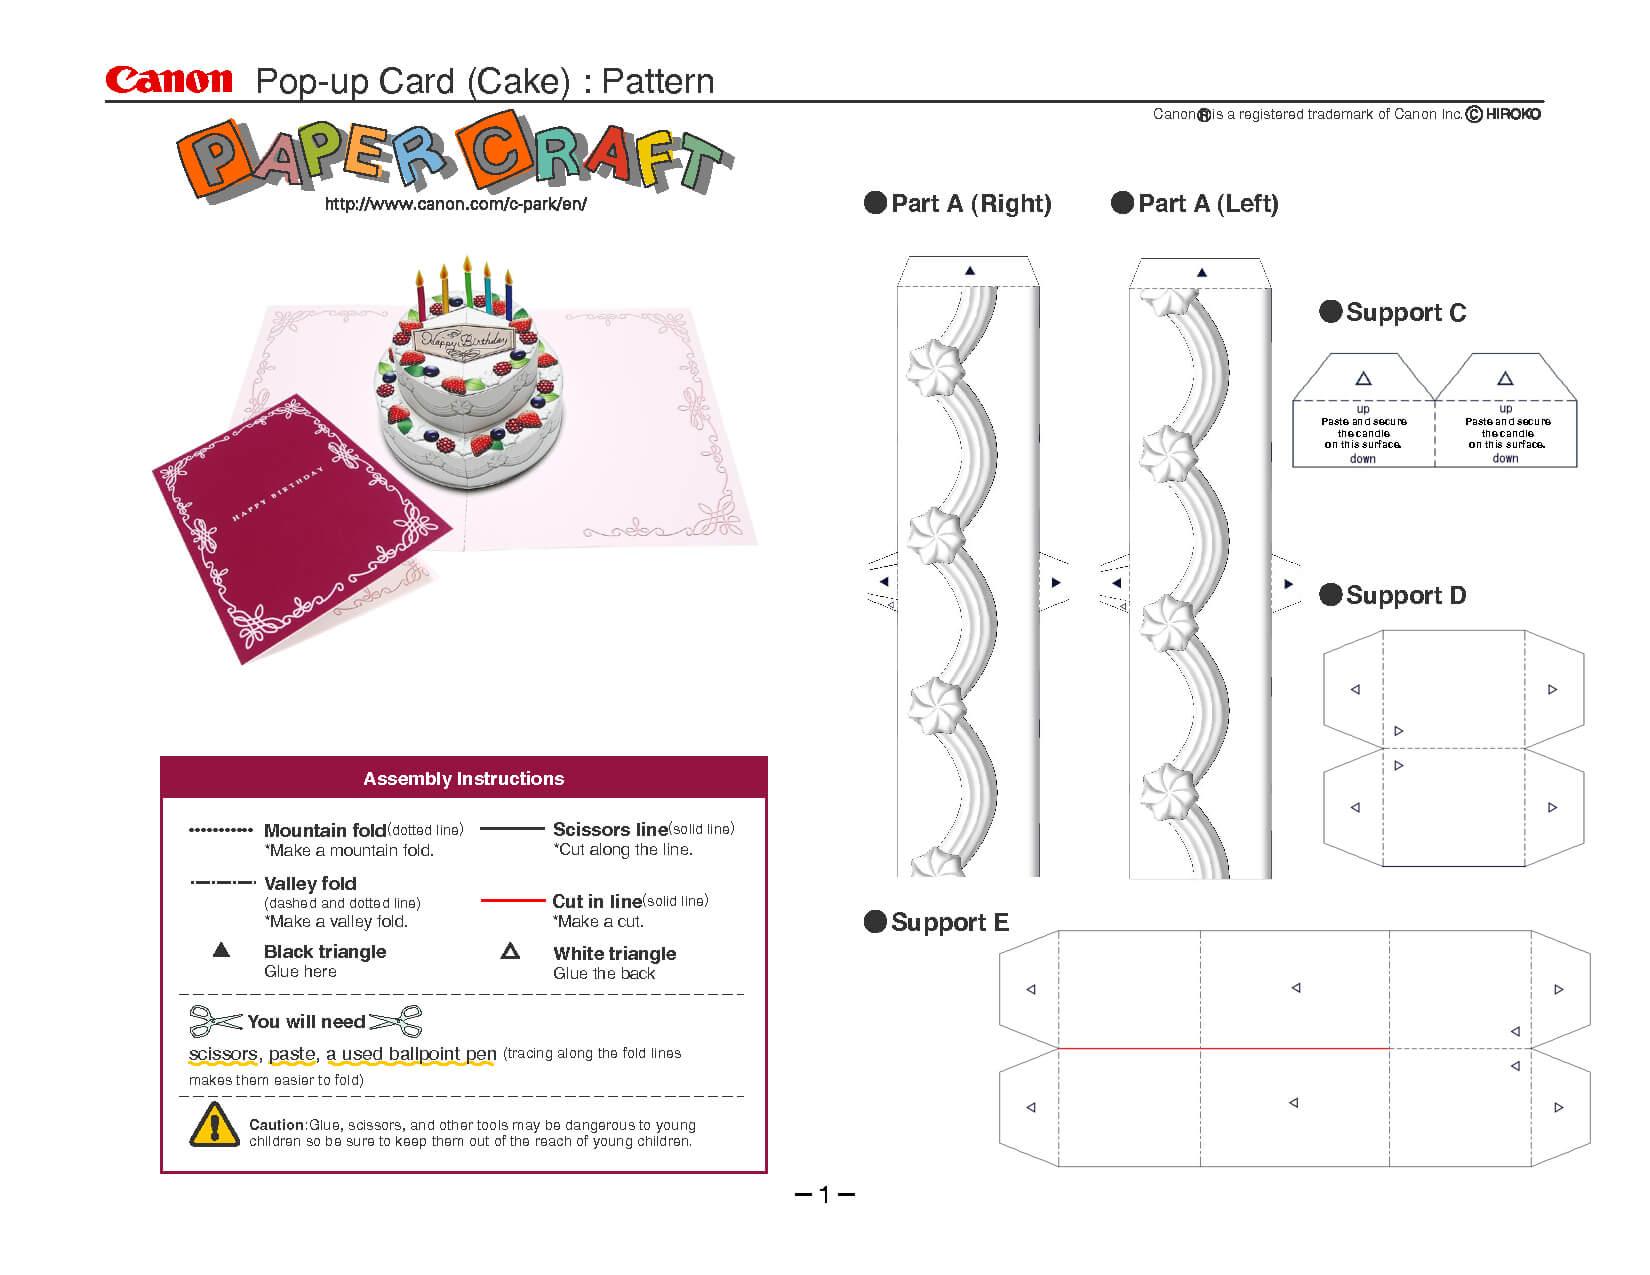 Birthday Cake Pop Up Card Template | Pop Up Card Templates With Printable Pop Up Card Templates Free